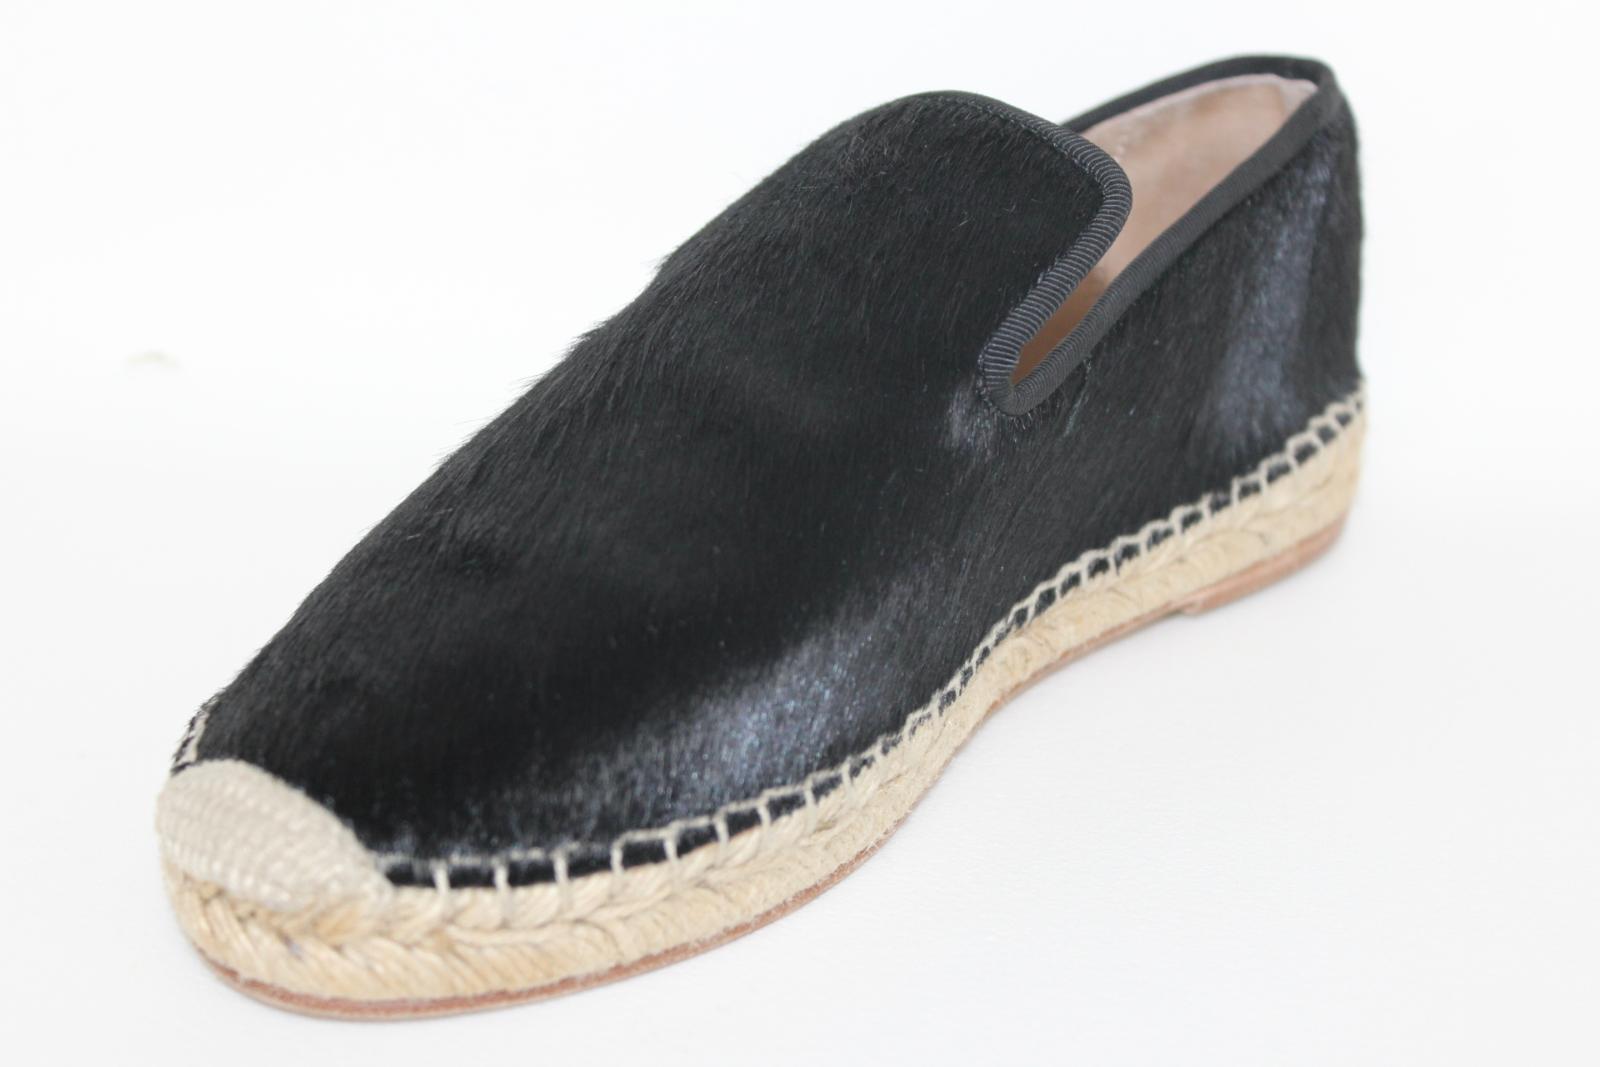 CELINE-Stacy-Black-Pony-Hair-Ladies-Flat-Espadrilles-Shoes-UK3-EU36-5-BNIB thumbnail 5